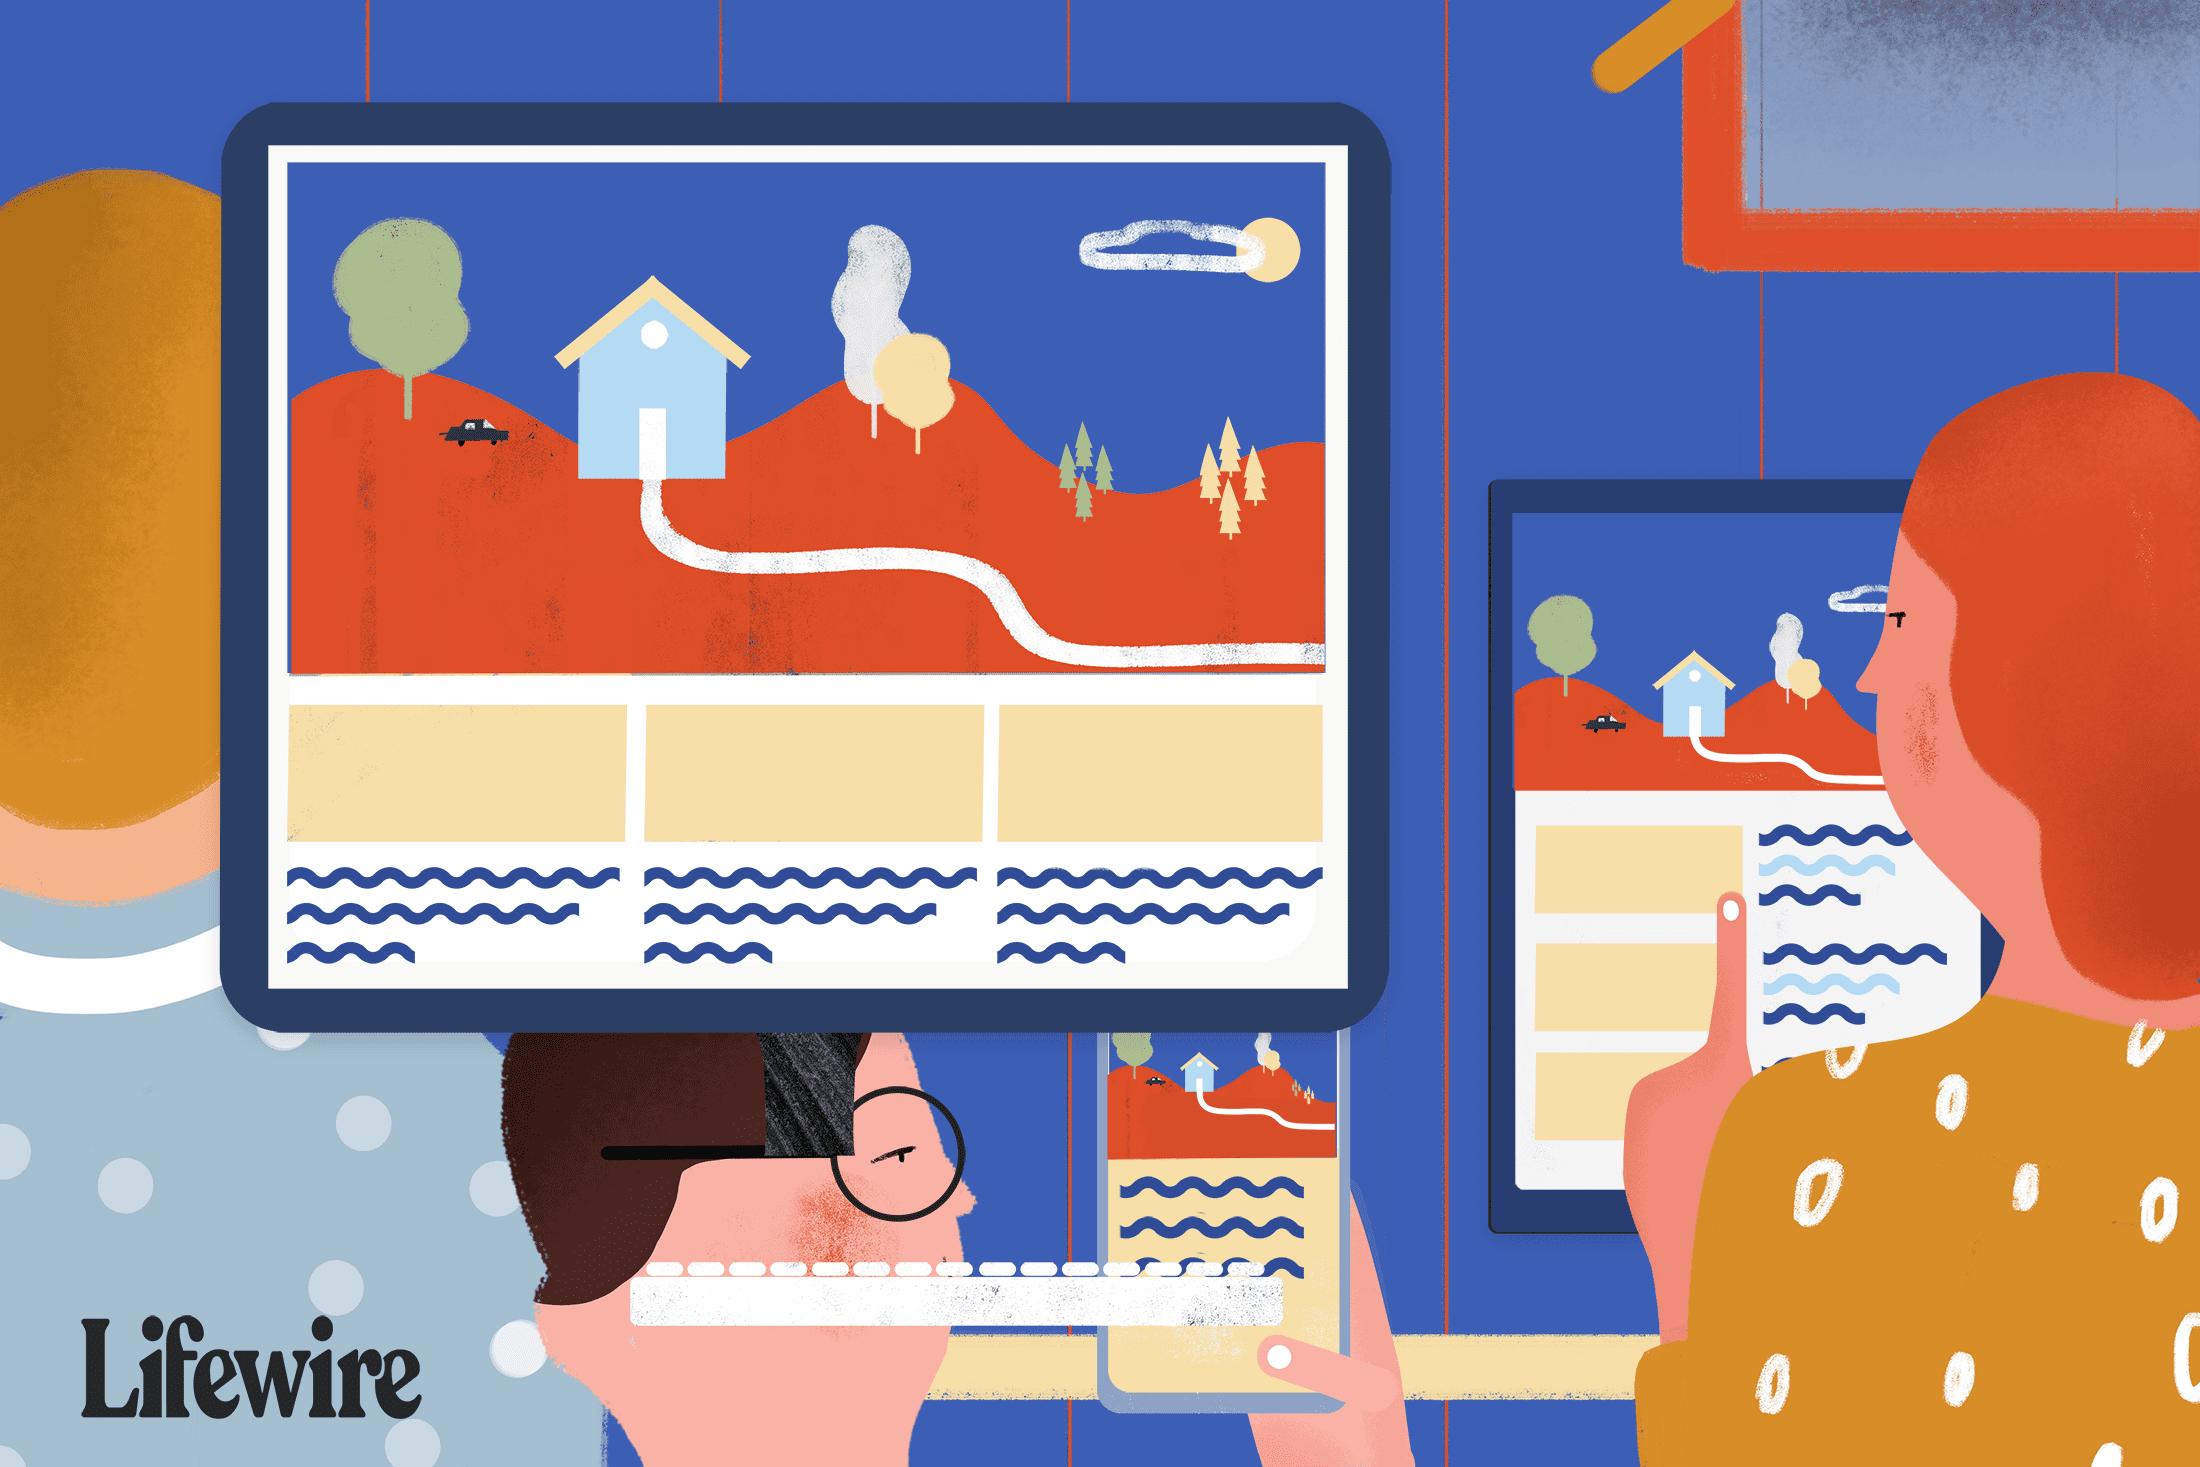 Illustration showing responsive vs. adaptive web design